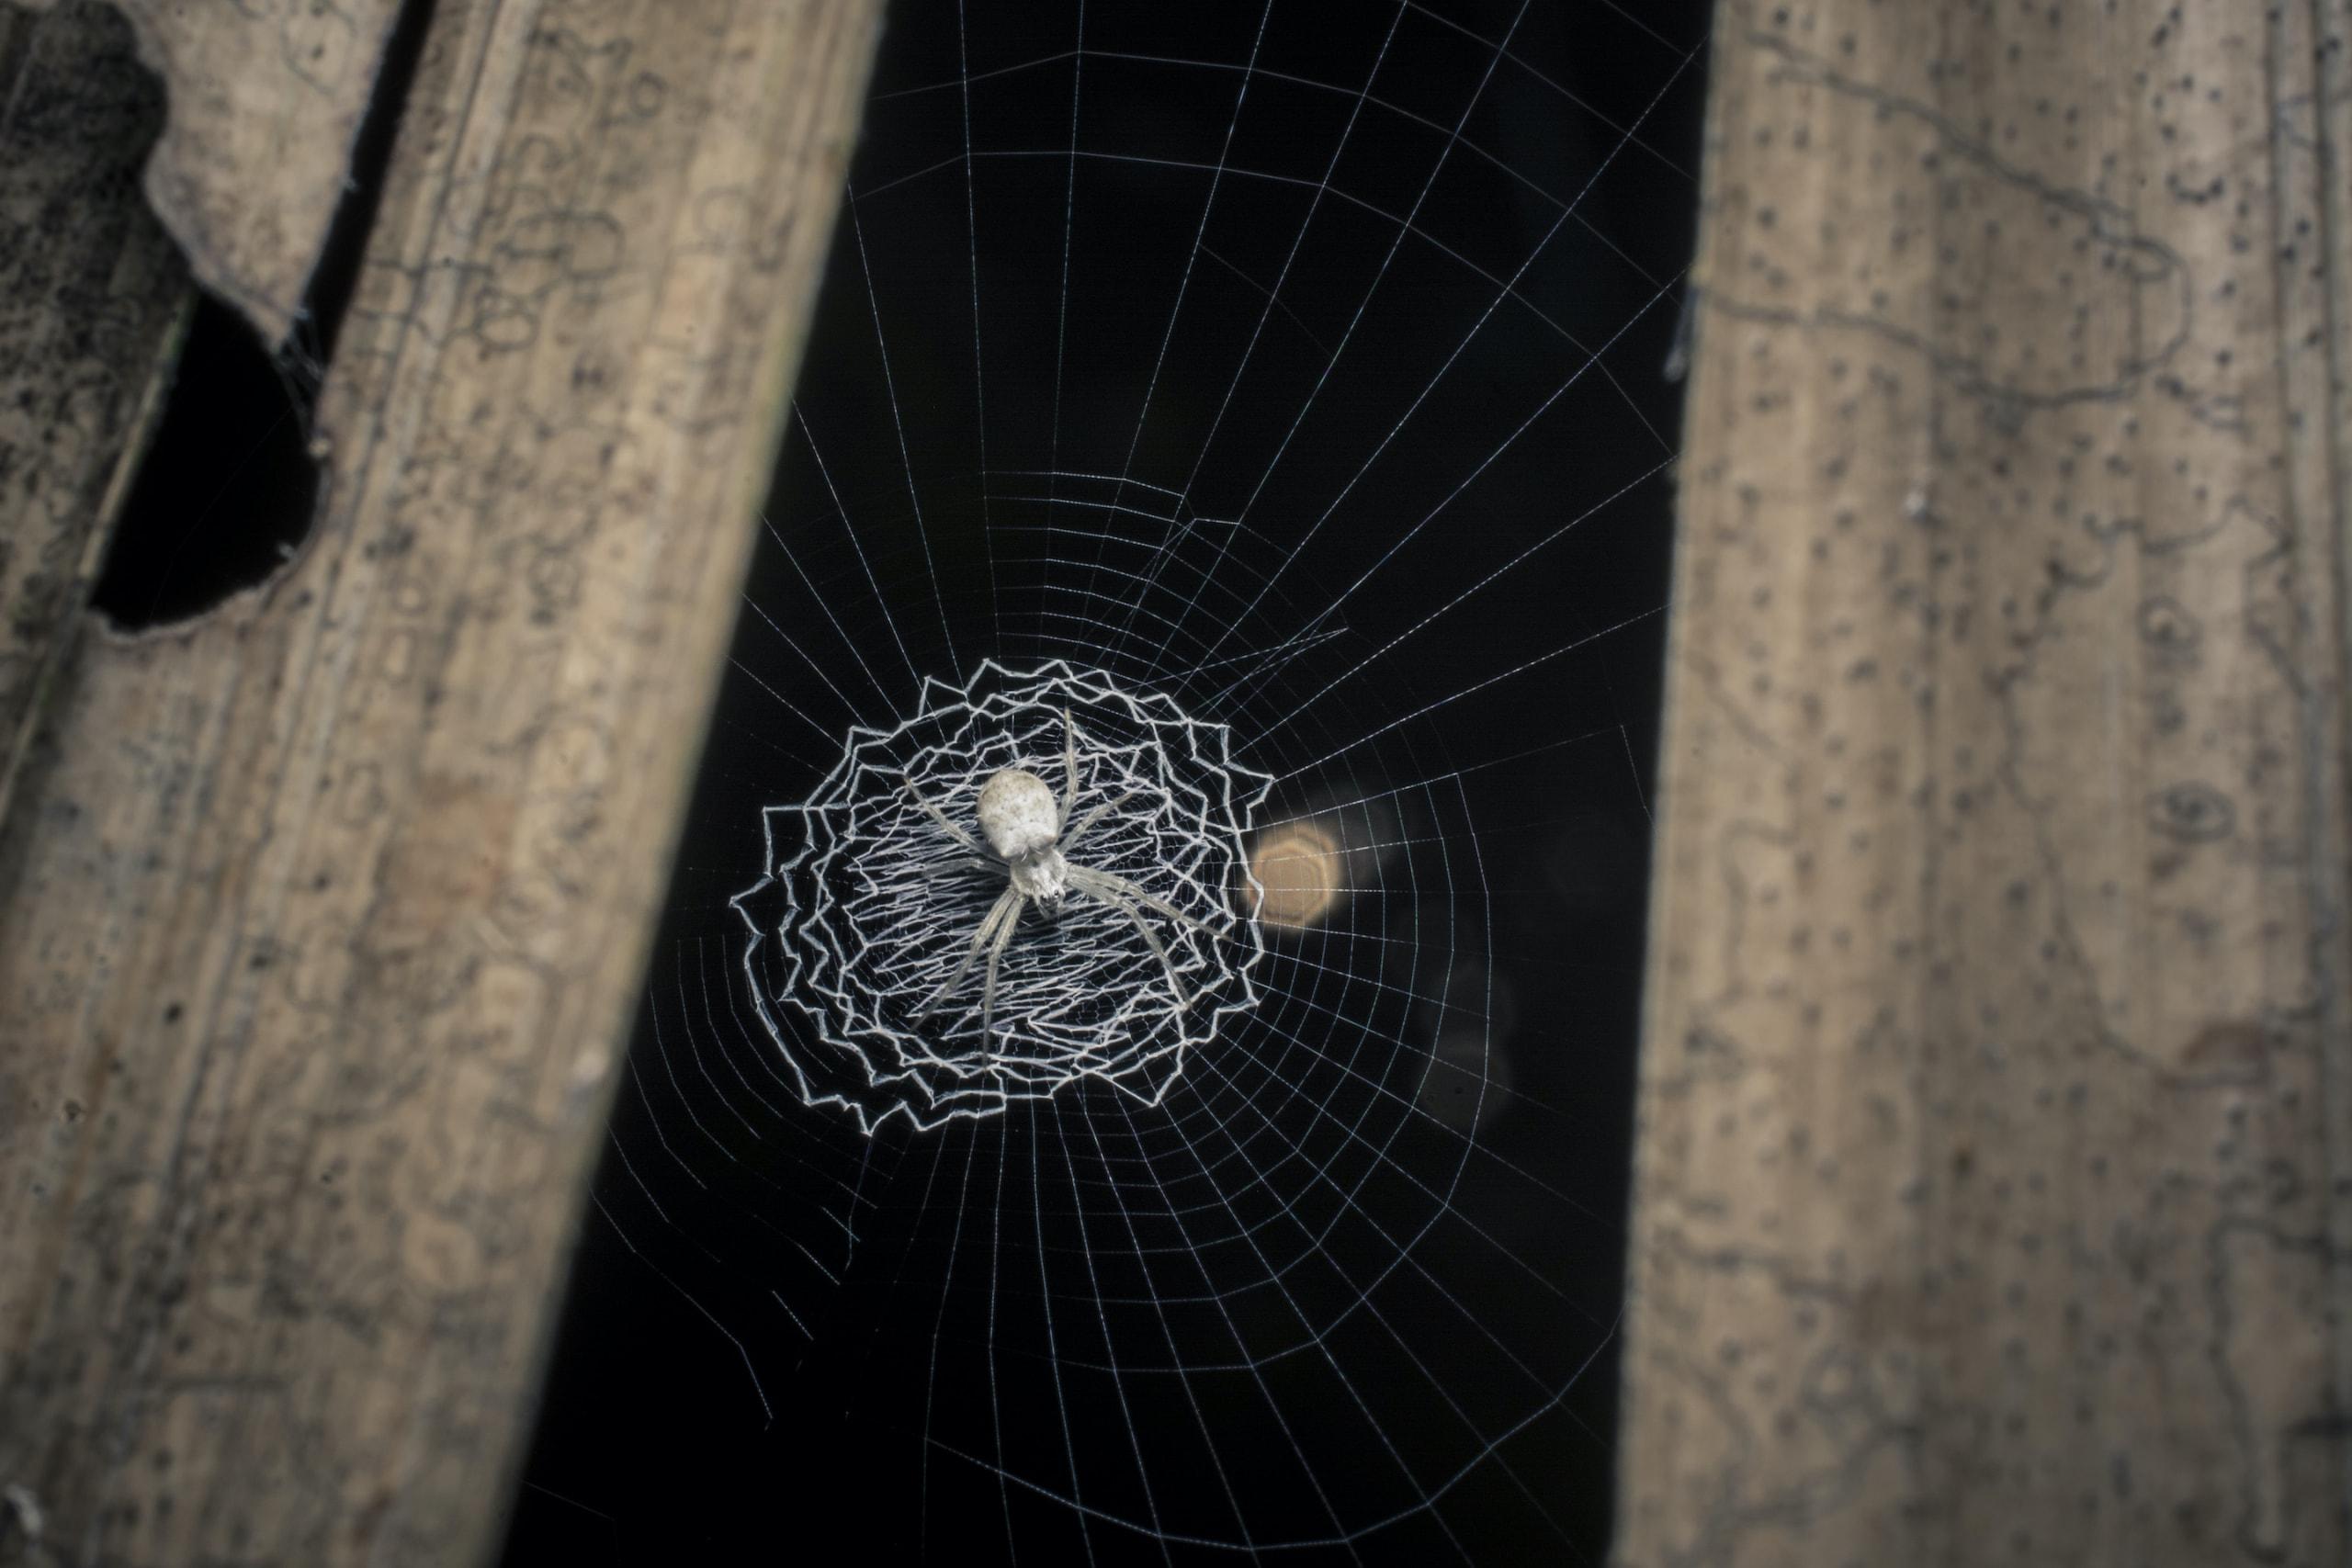 Spirals Through Time: Evolution of Orb-weaver Webs